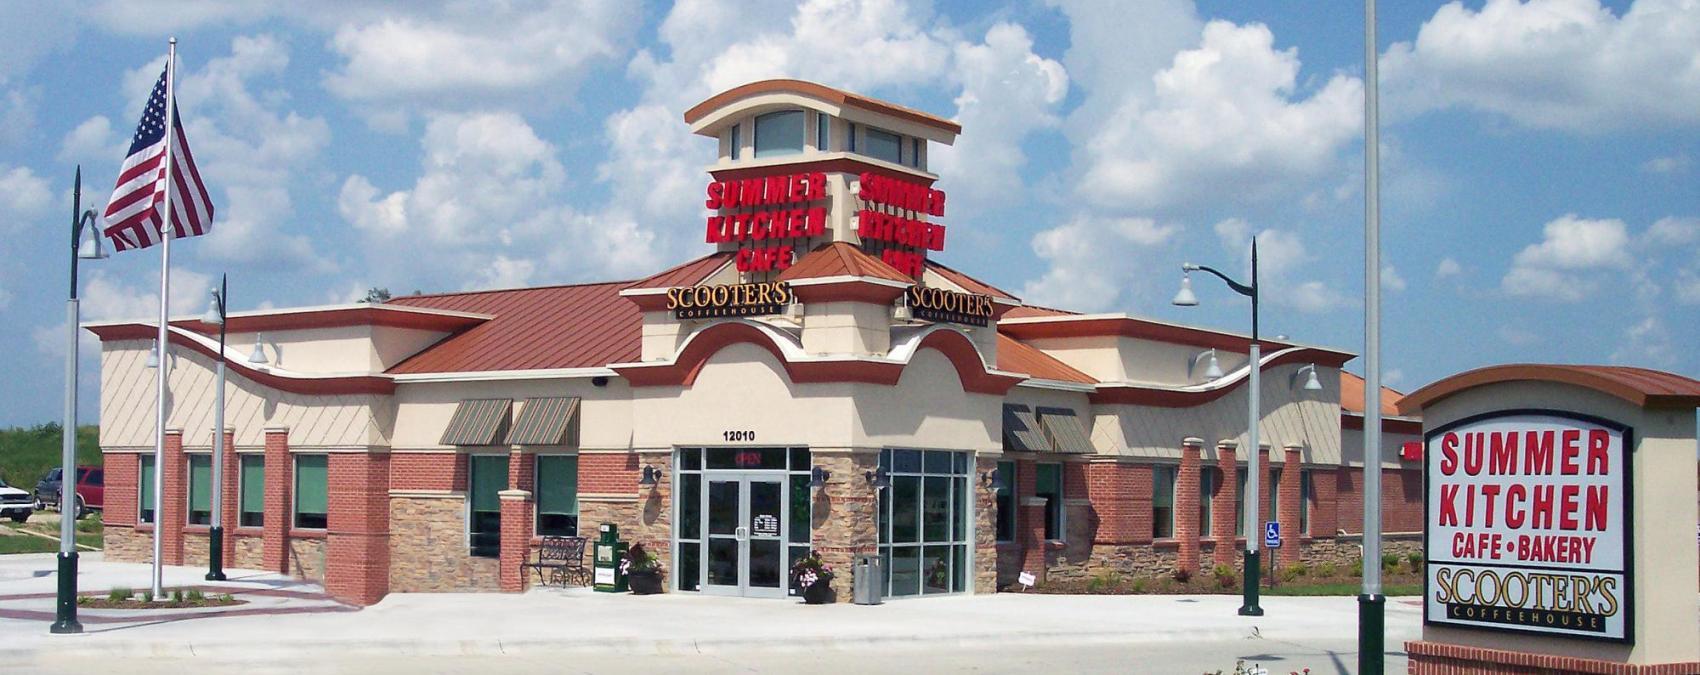 Summer Kitchen Cafe - La Vista | Darland Construction - Building to ...